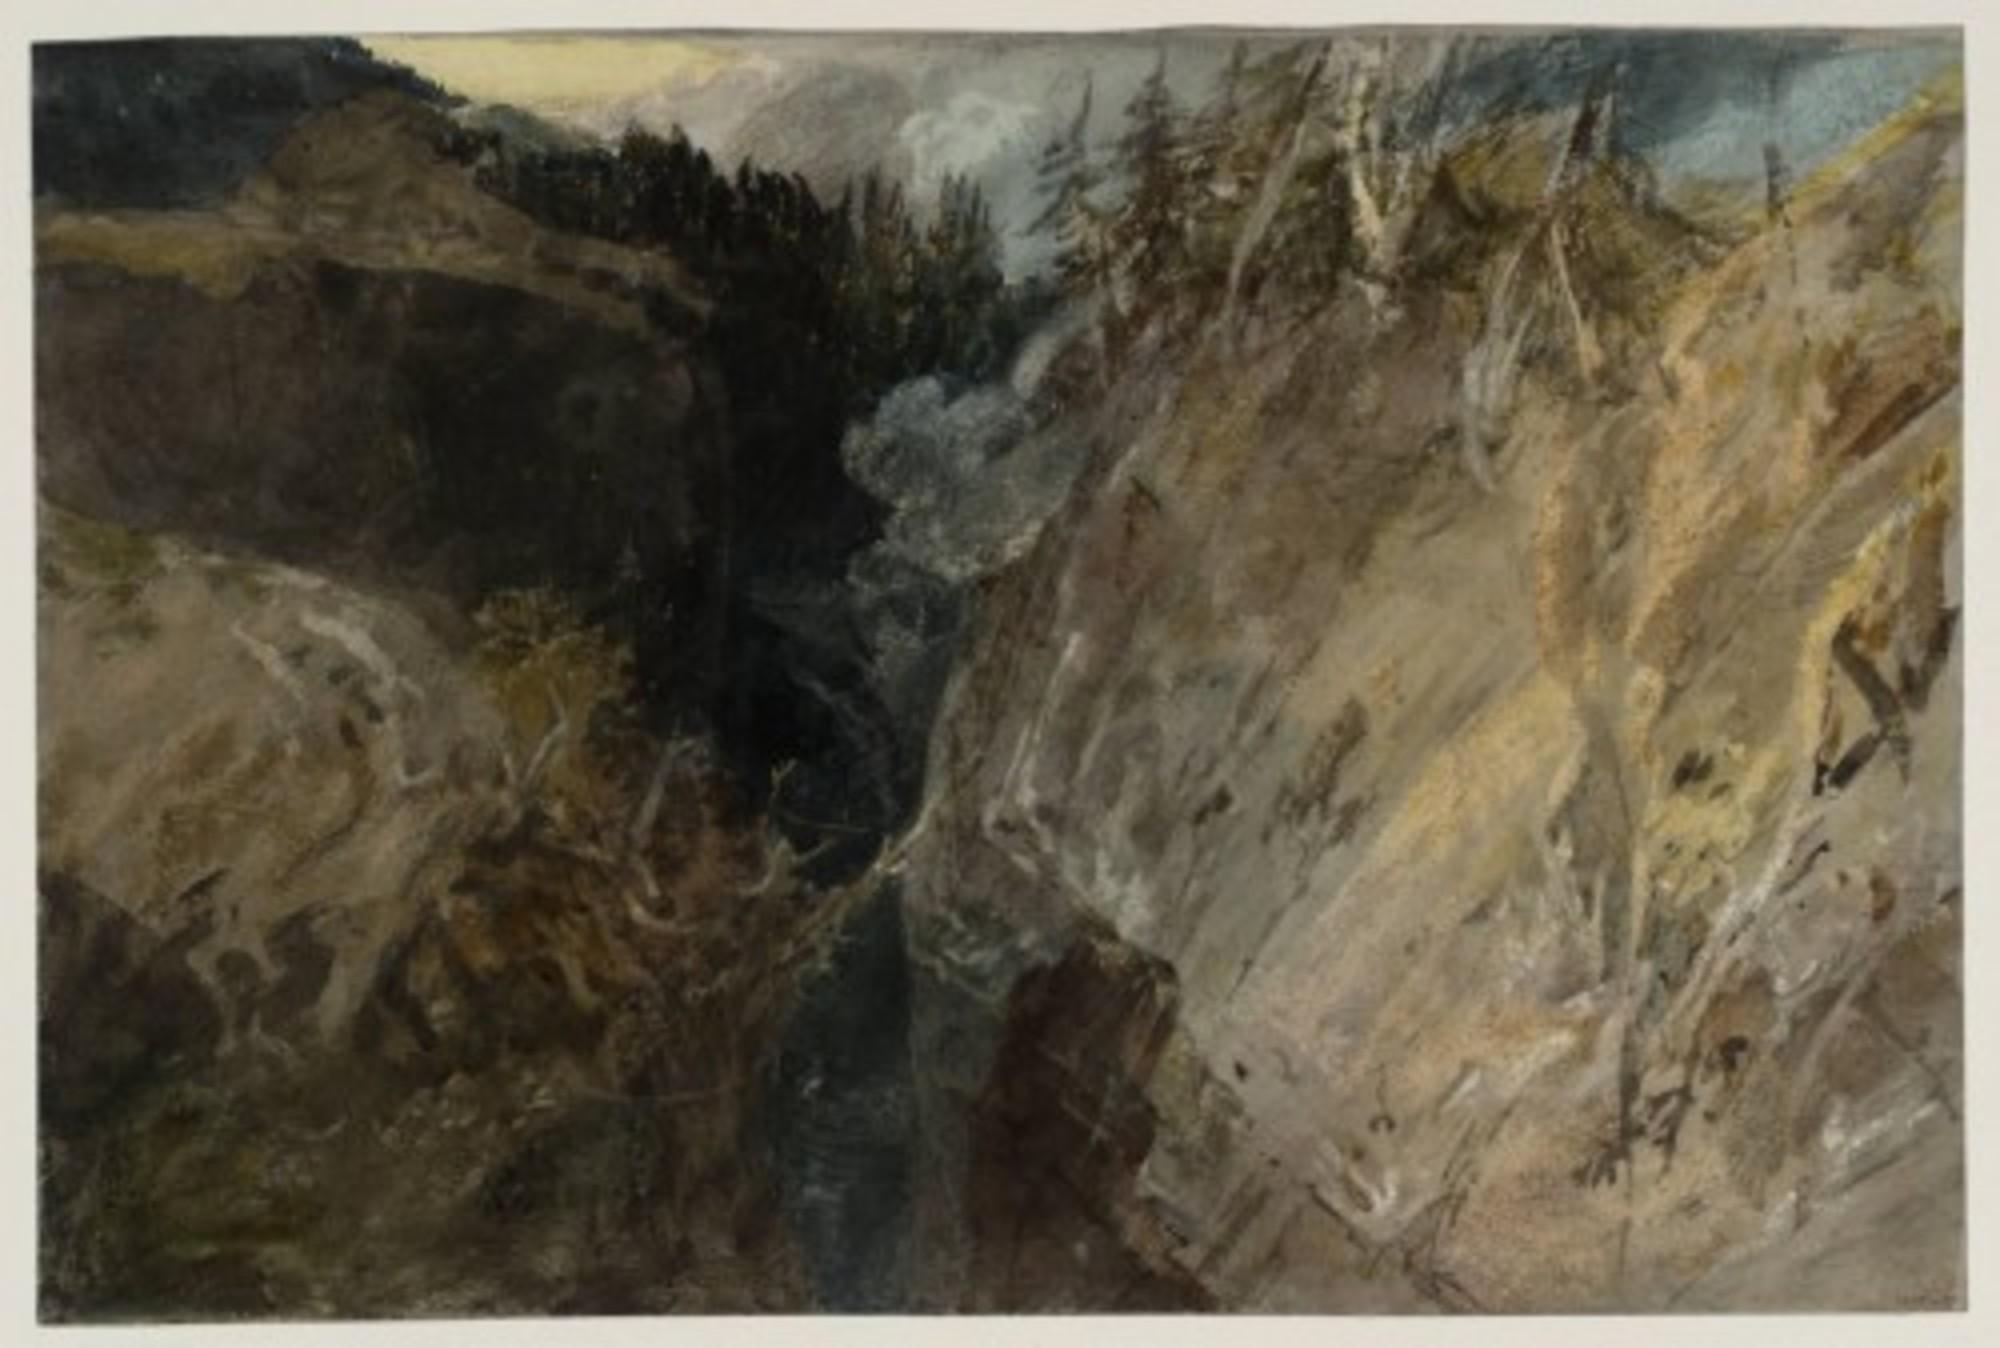 A-Ravine-in-the-Pass-of-St-Gotthard-1802.jpg